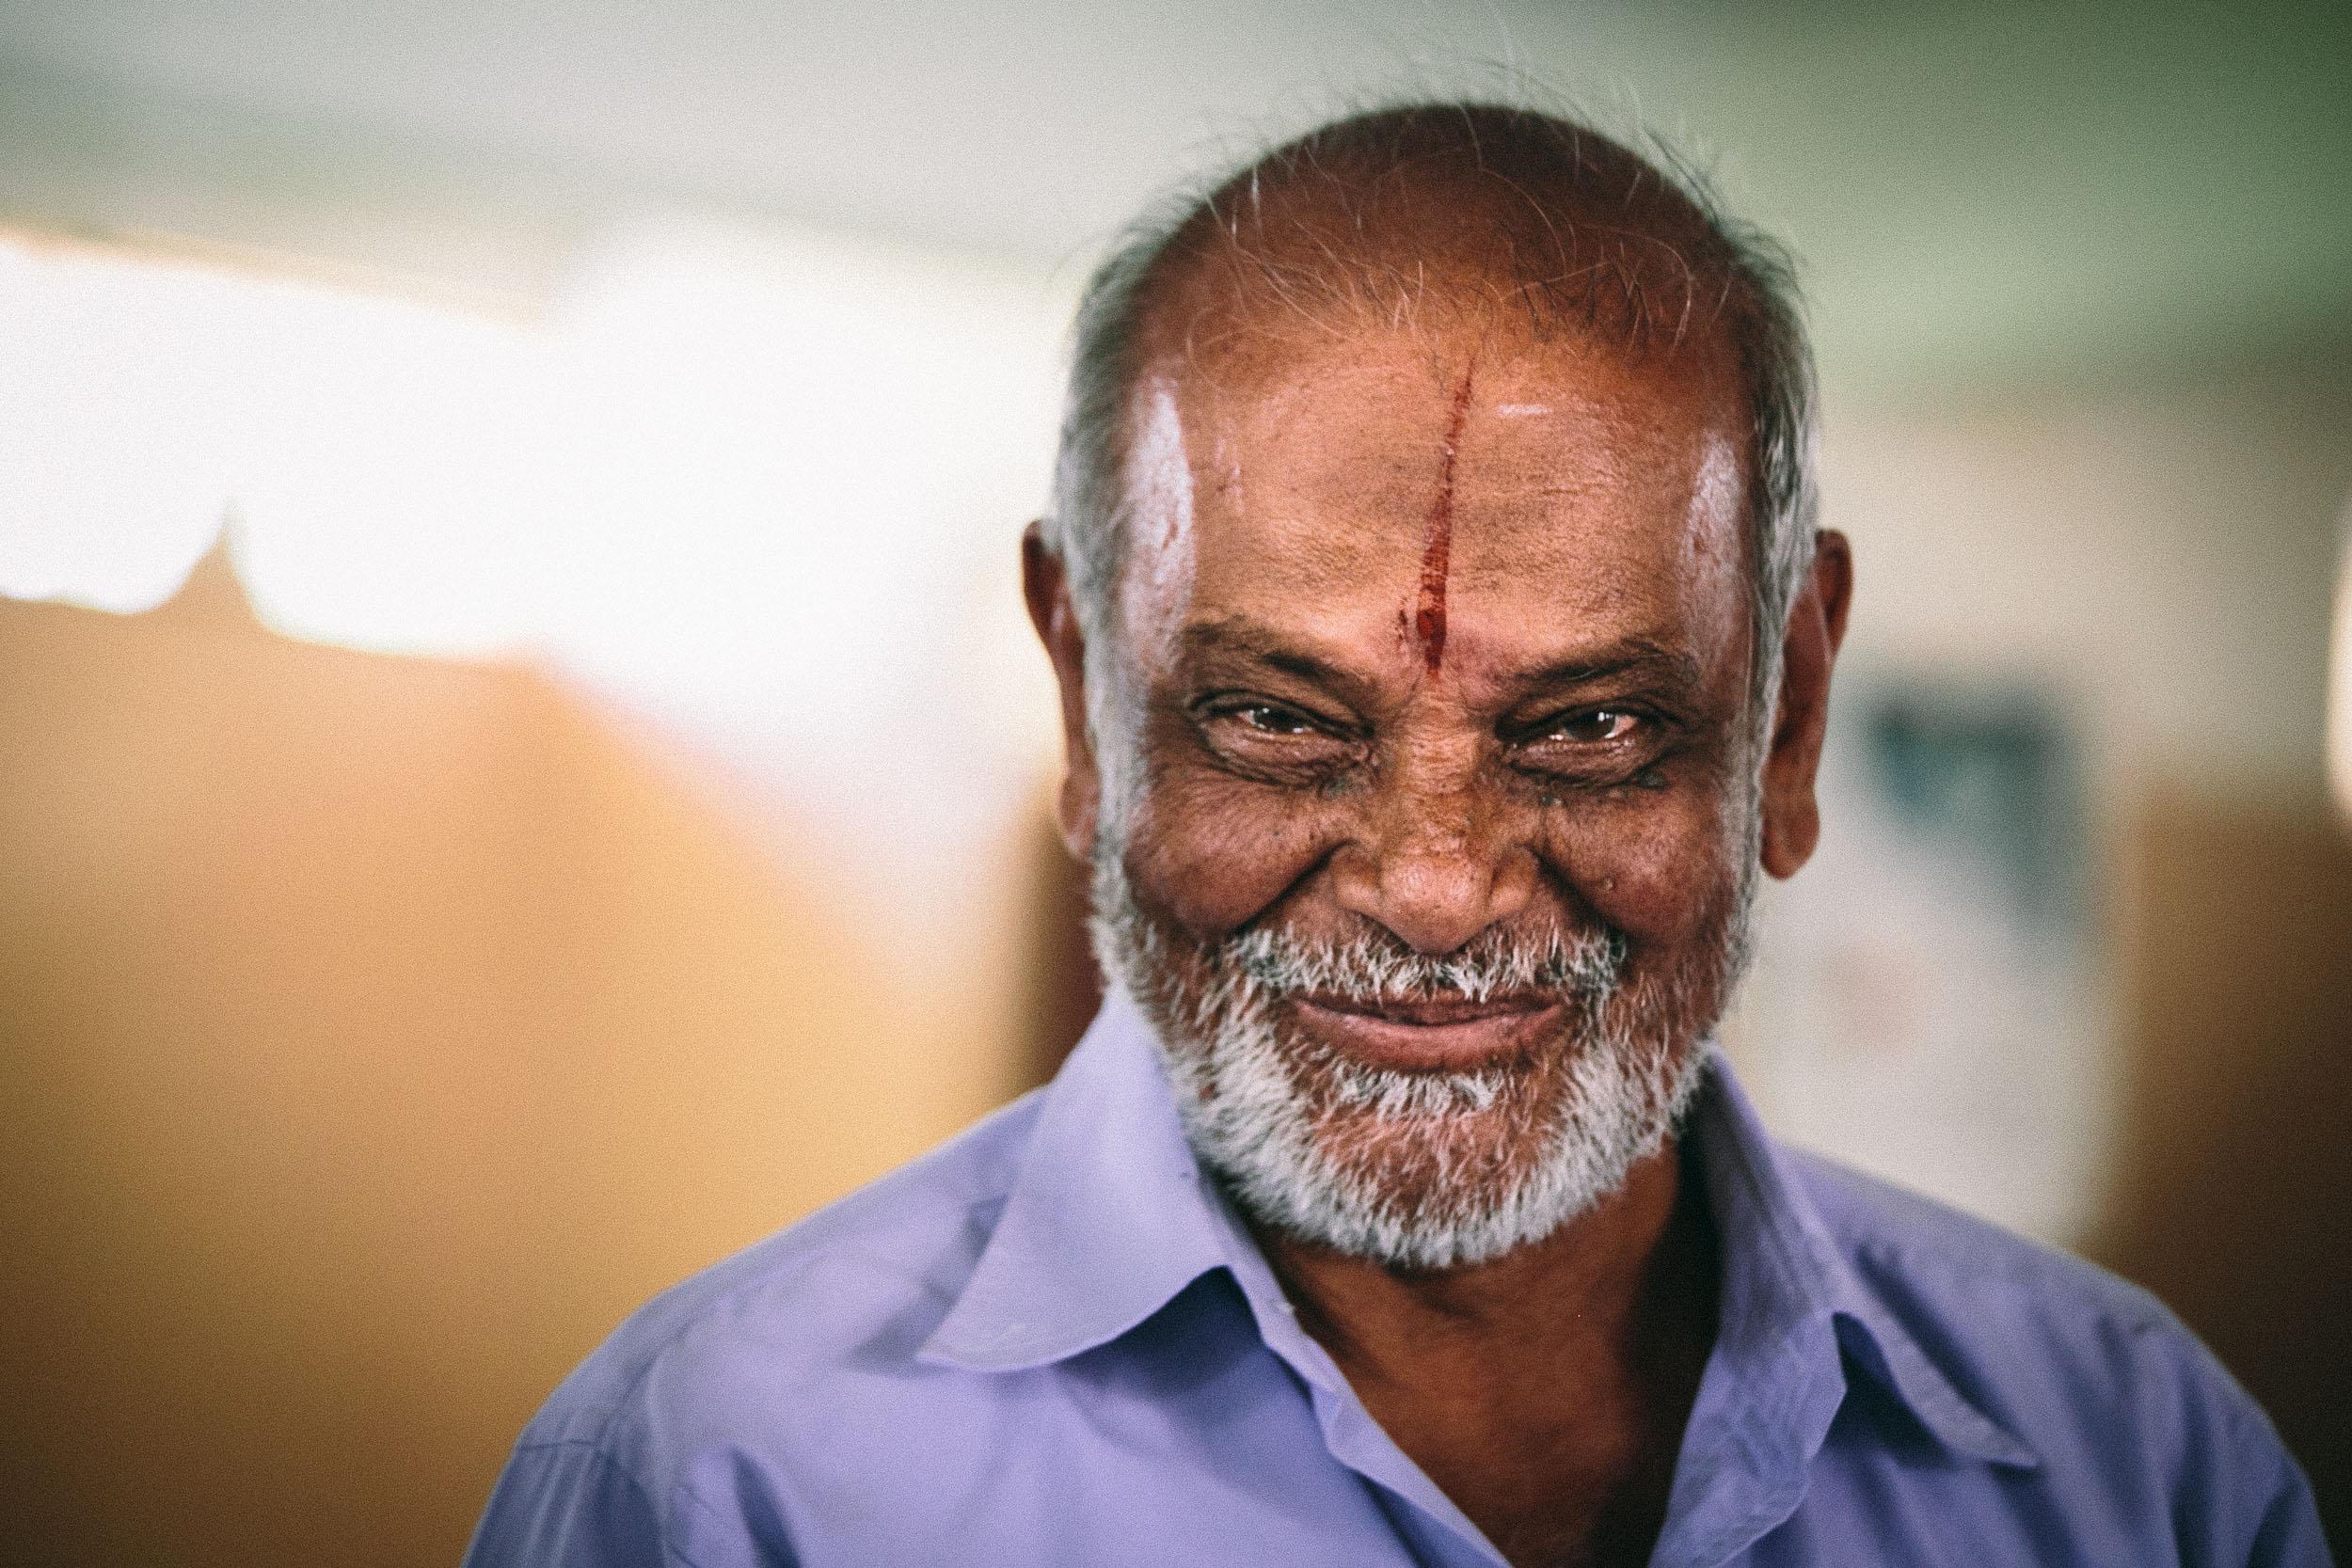 brian-callaway-india-photography-aravind-eye-hospital-33.jpg